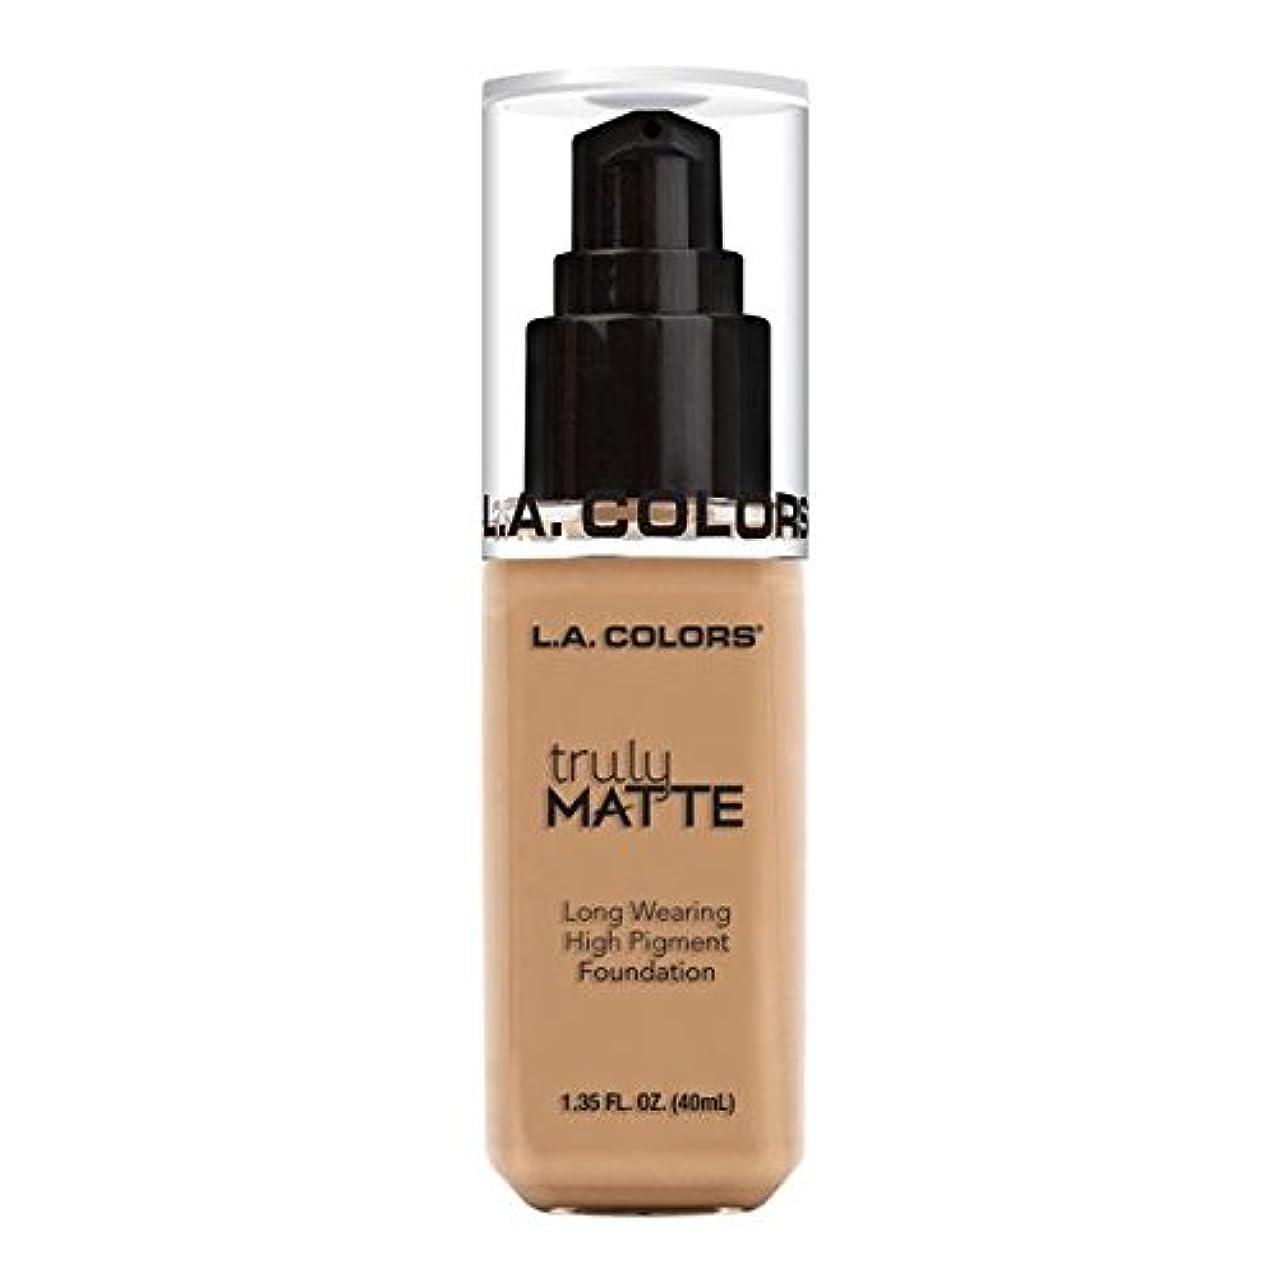 (3 Pack) L.A. COLORS Truly Matte Foundation - Soft Beige (並行輸入品)